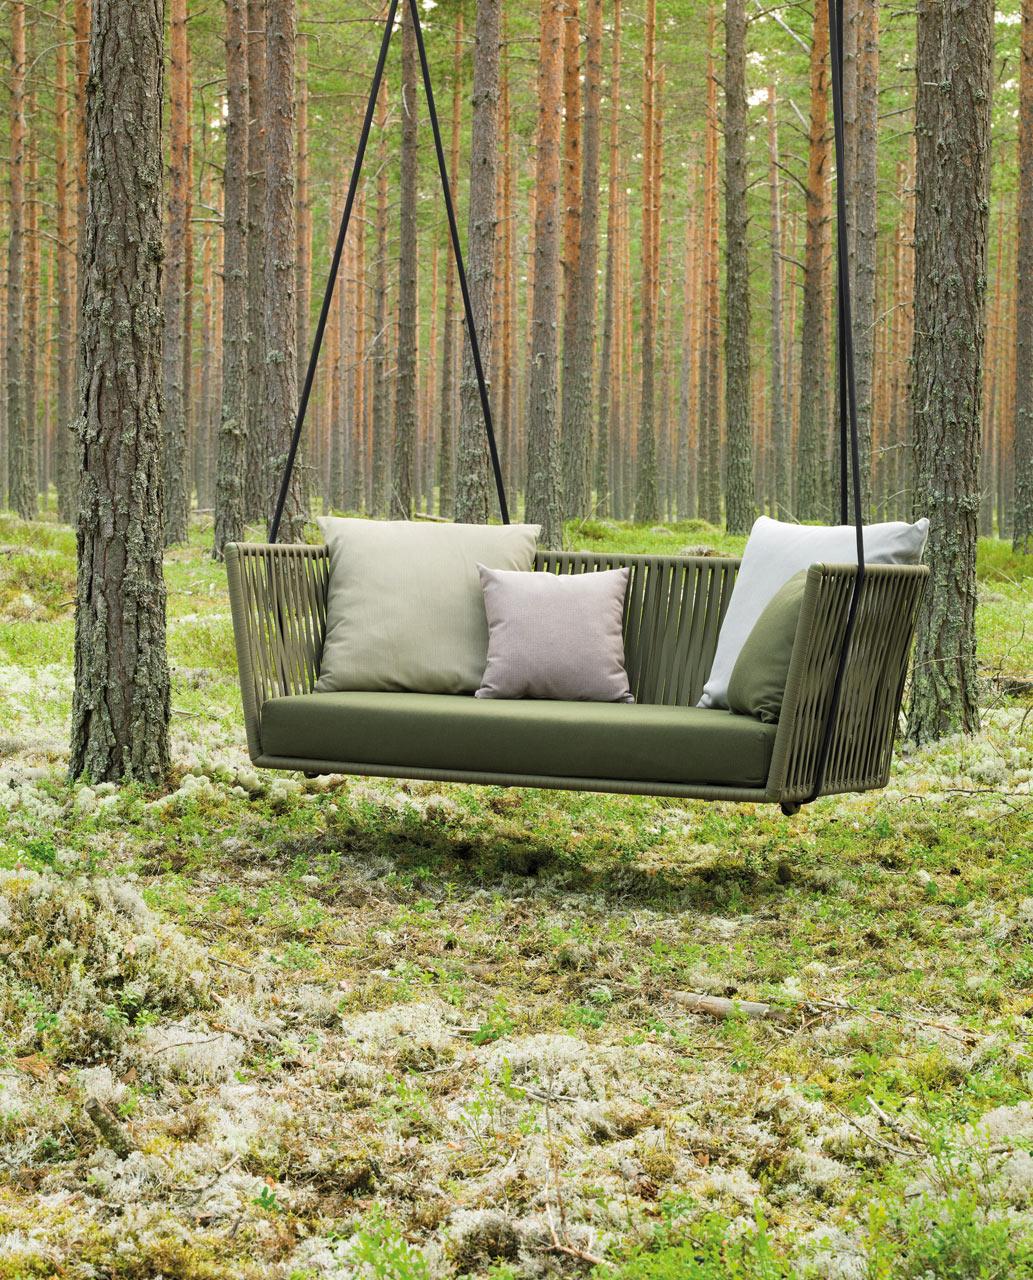 Bitta modern patio furniture by rodolfo dordoni - Braided Outdoor Furniture By Rodolfo Dordoni For Kettal